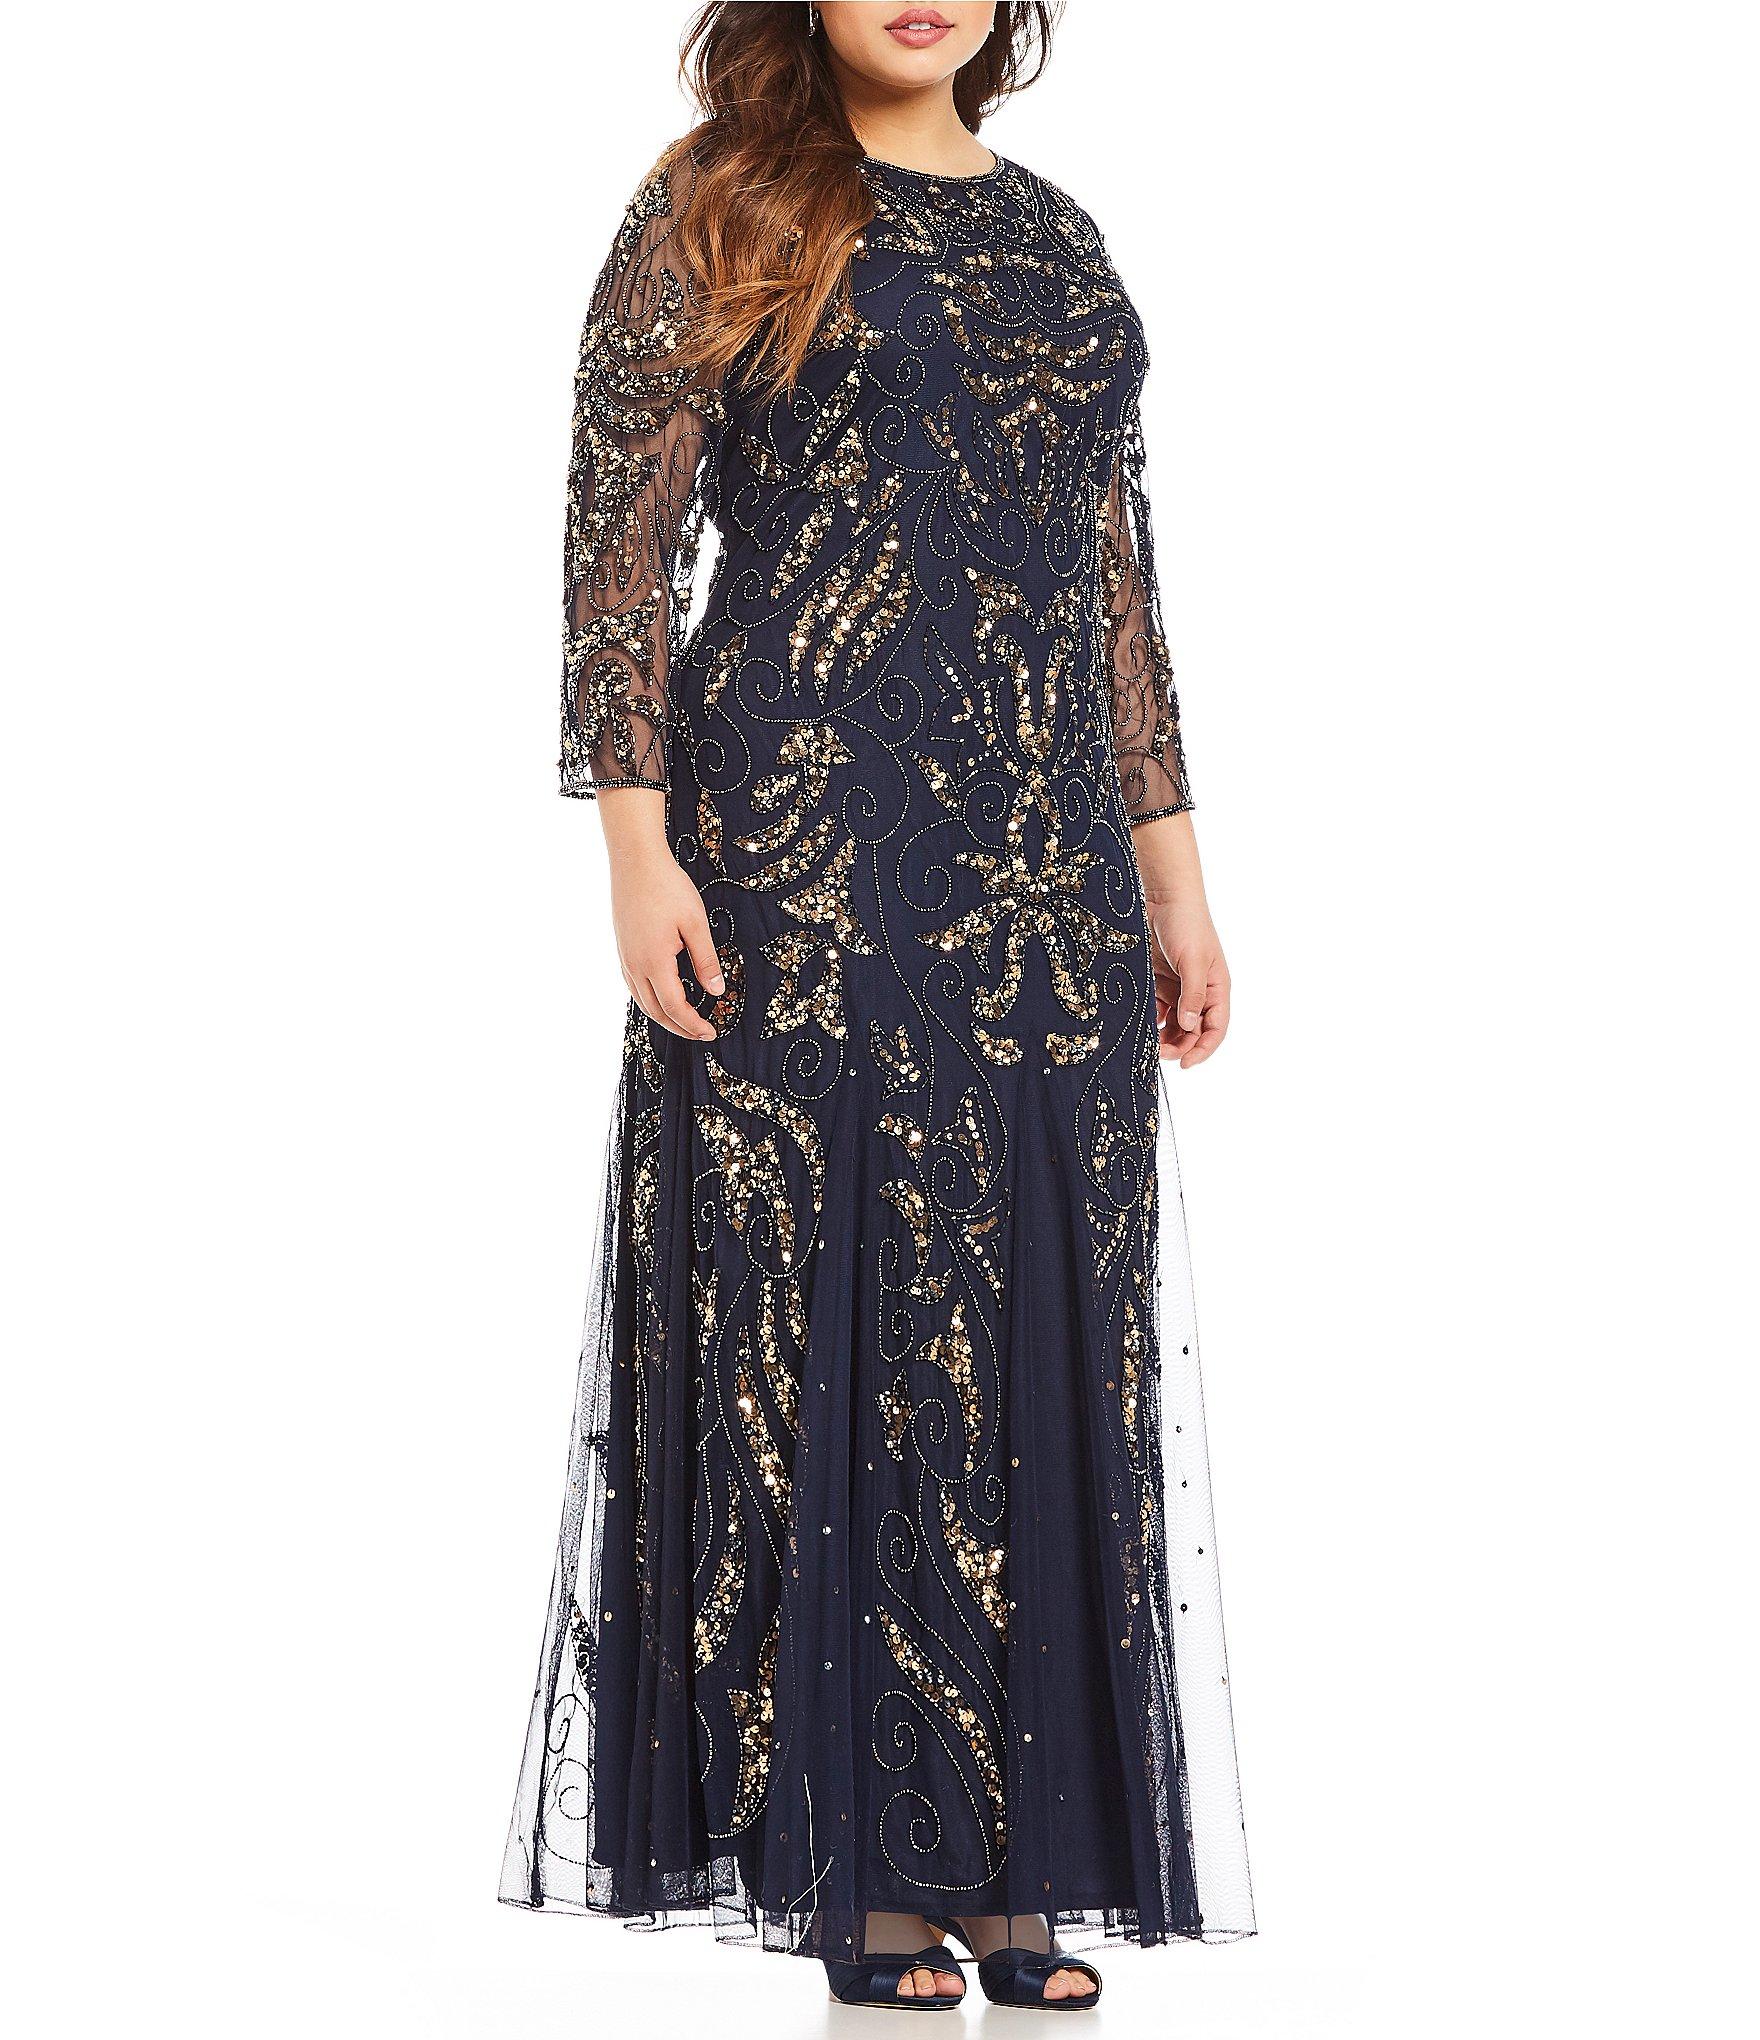 Plus-Size Formal Dresses & Gowns | Dillards